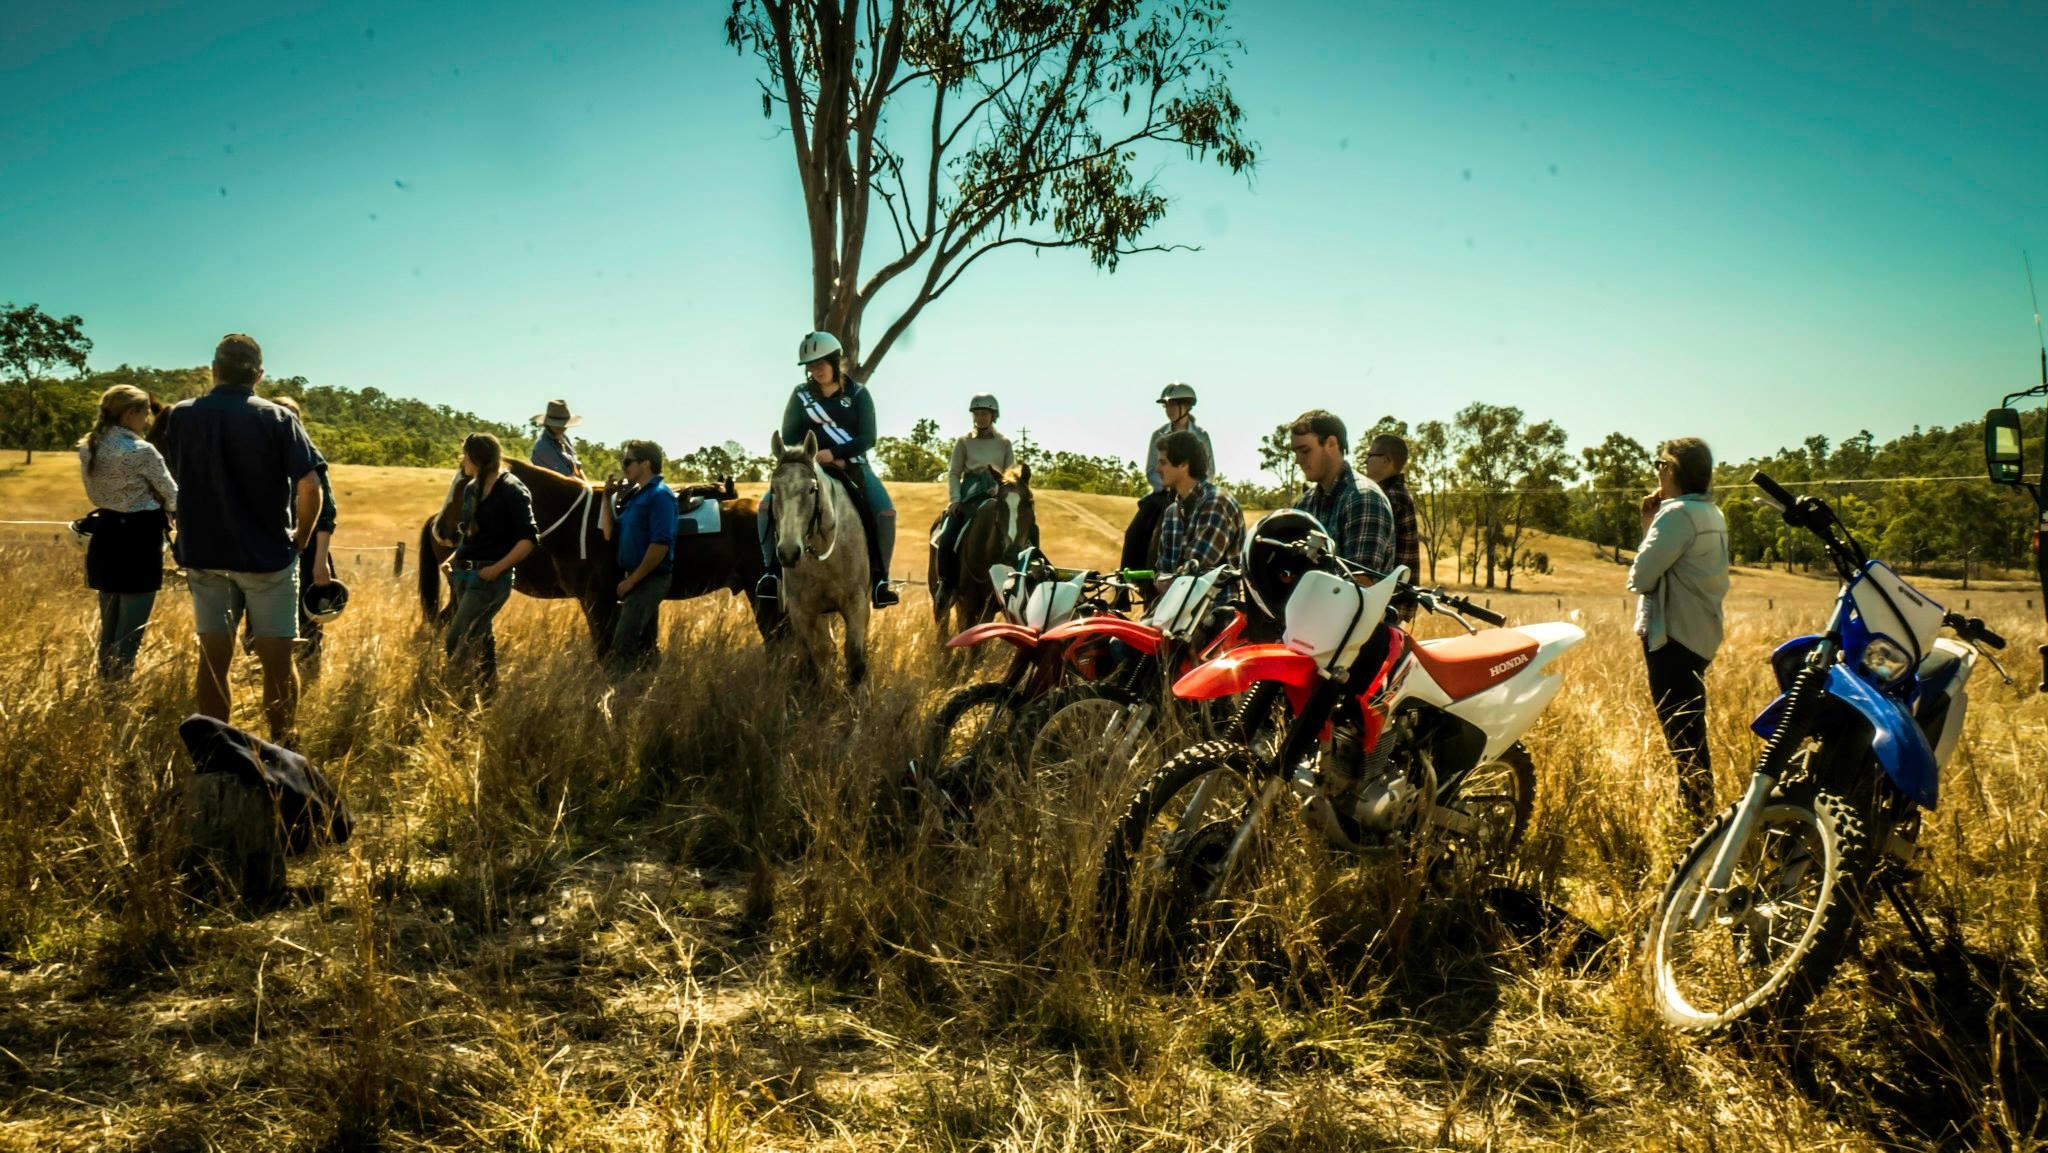 Oyster Worldwide – Ranch or Horse Work in Australia